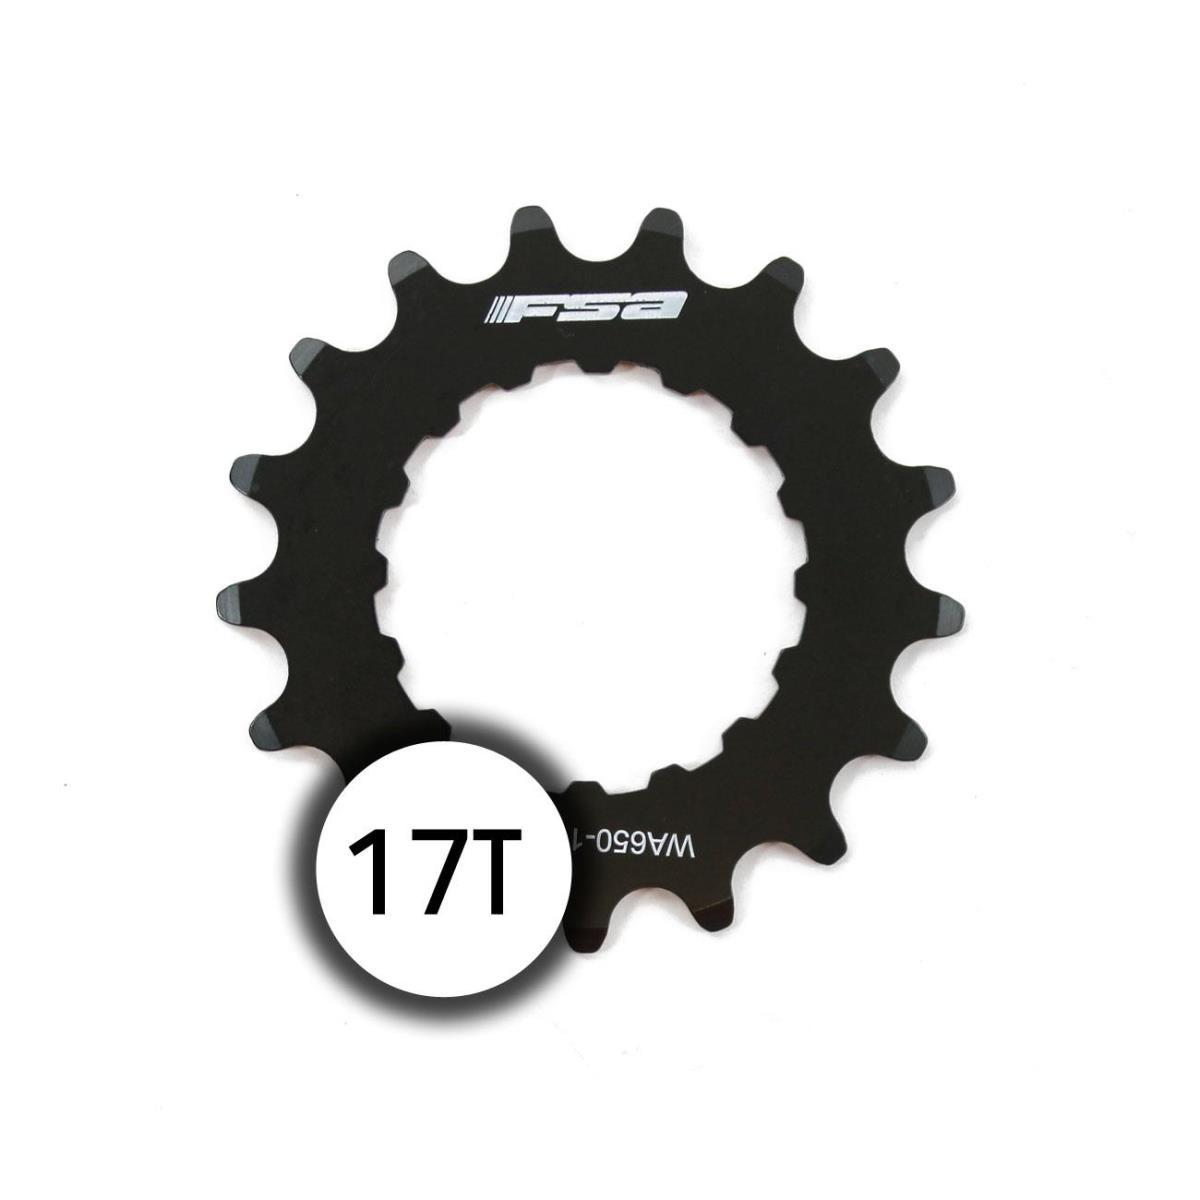 sprocket 17t bosch ebike chainring wa650 stainless steel black